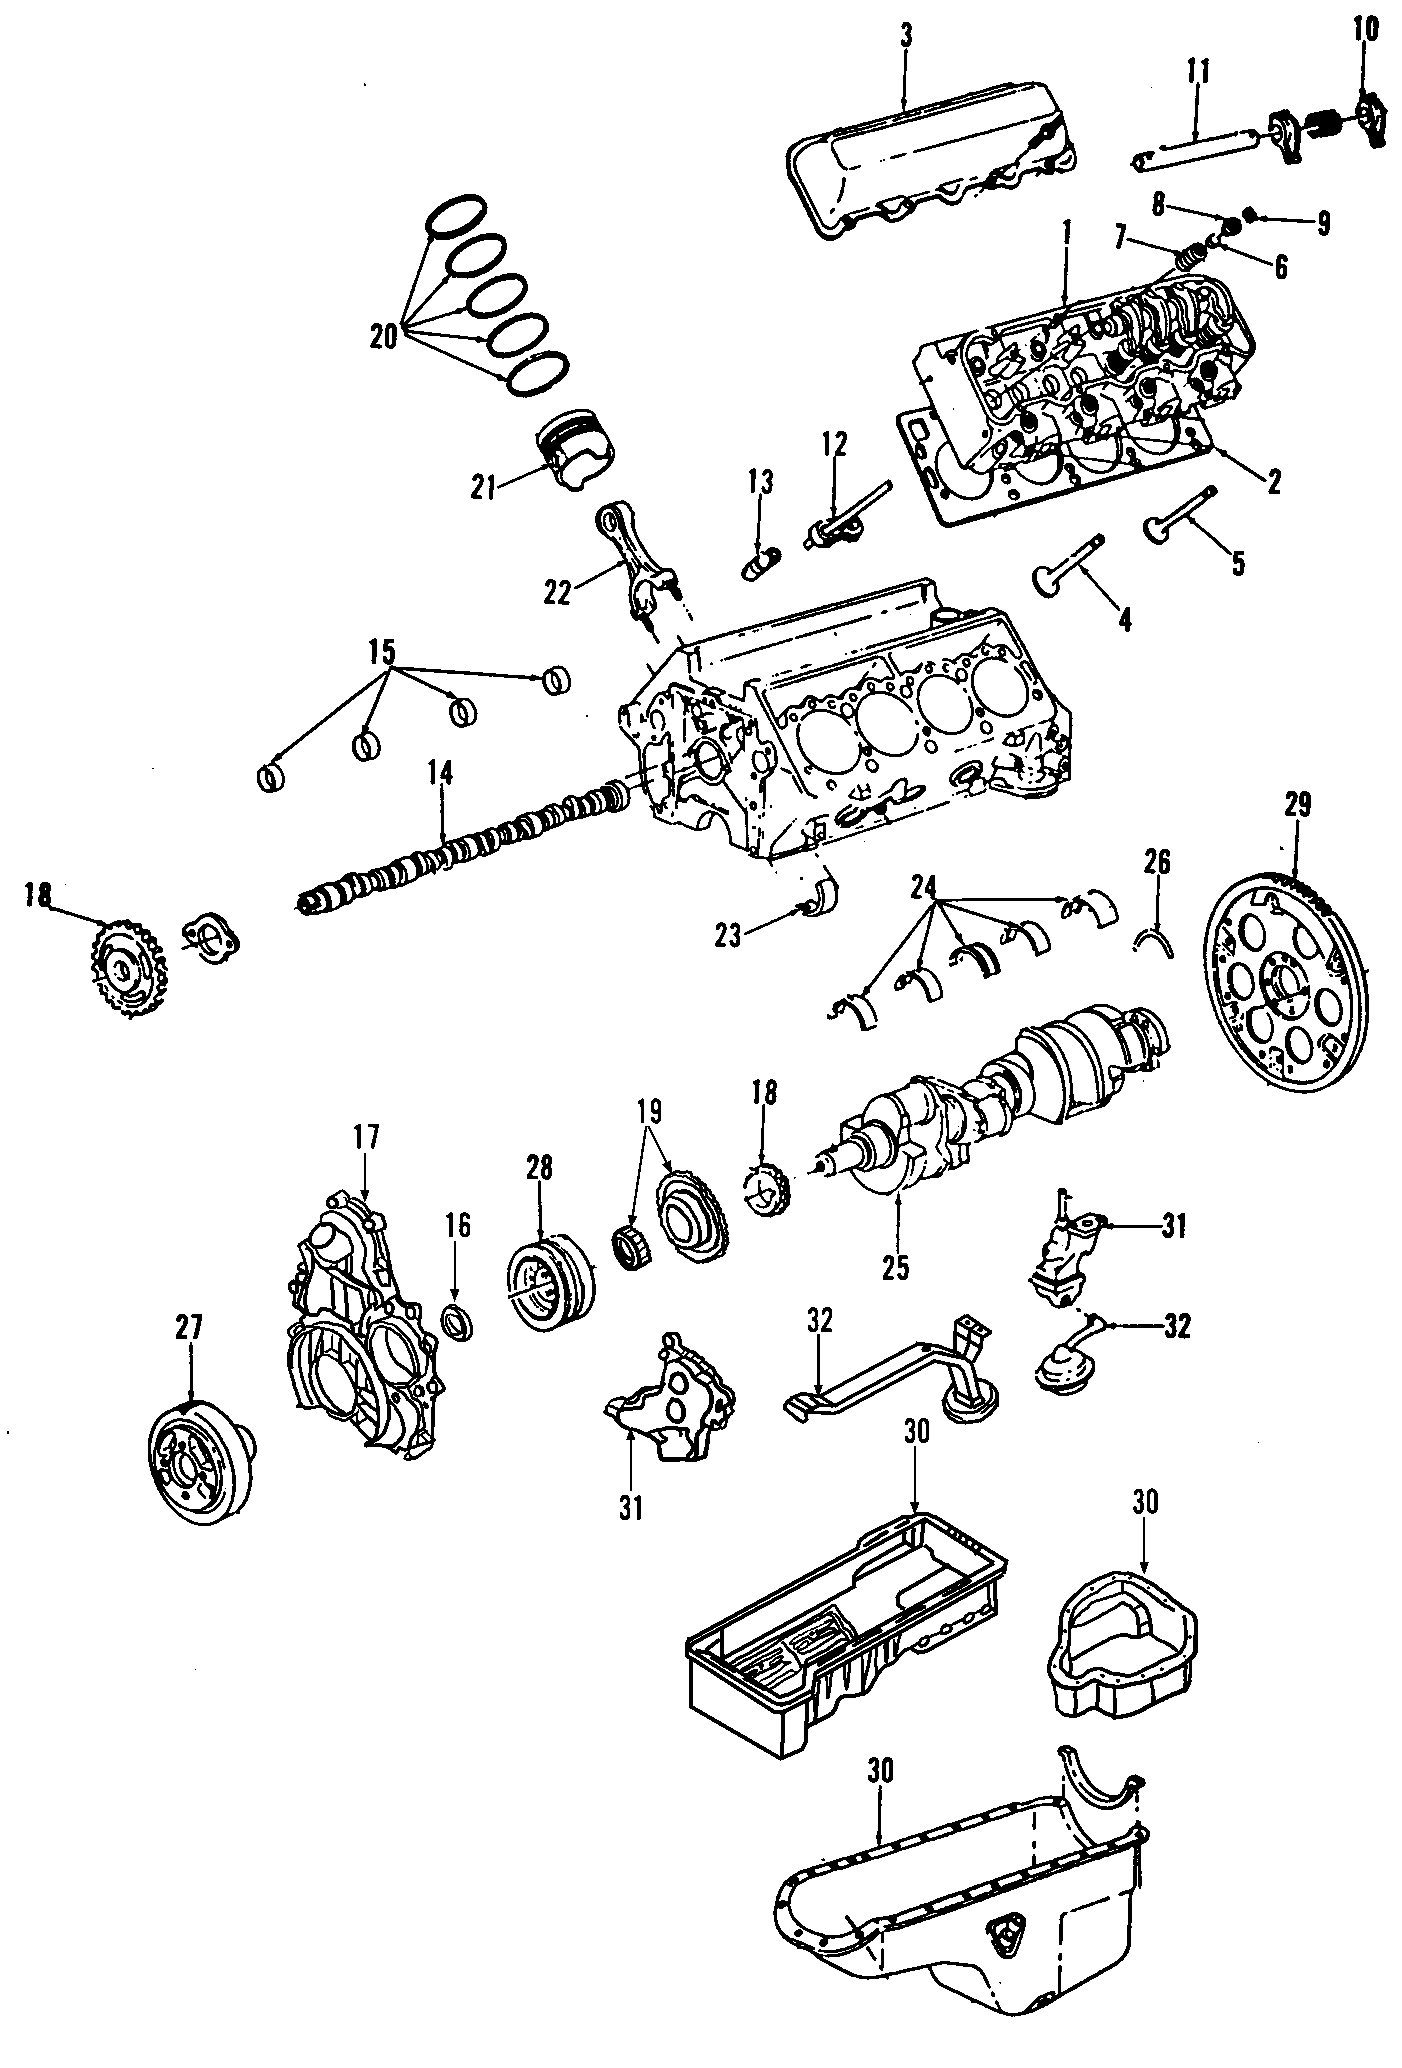 Chevrolet Silverado Hd Crankshaft Assembly All